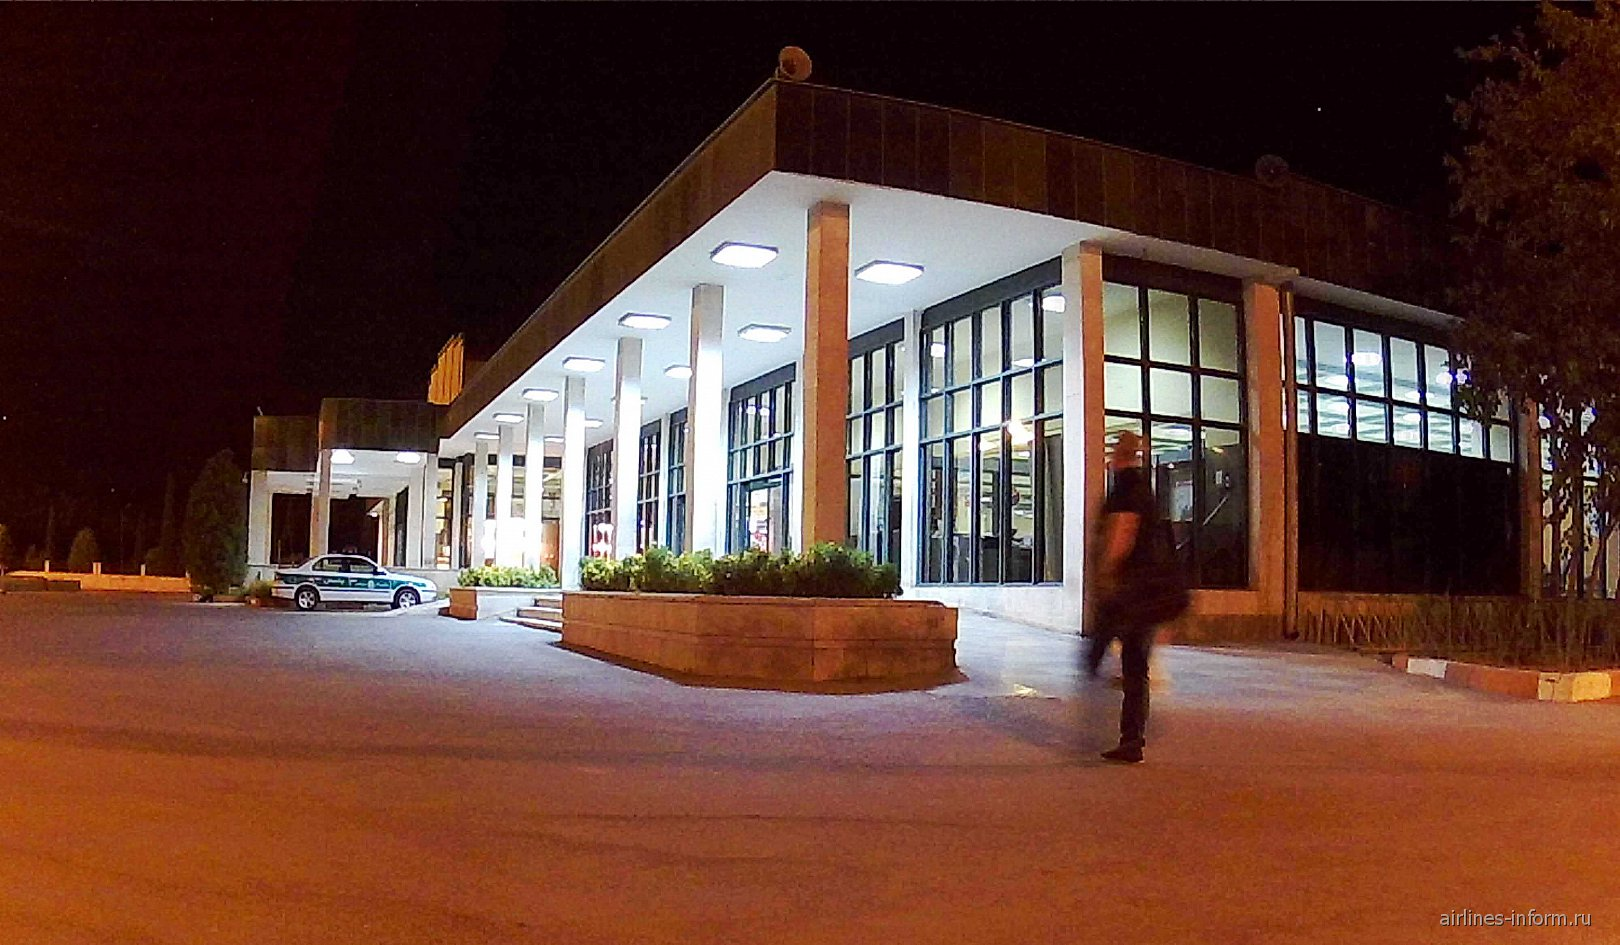 Аэровокзал аэропорта Шираз